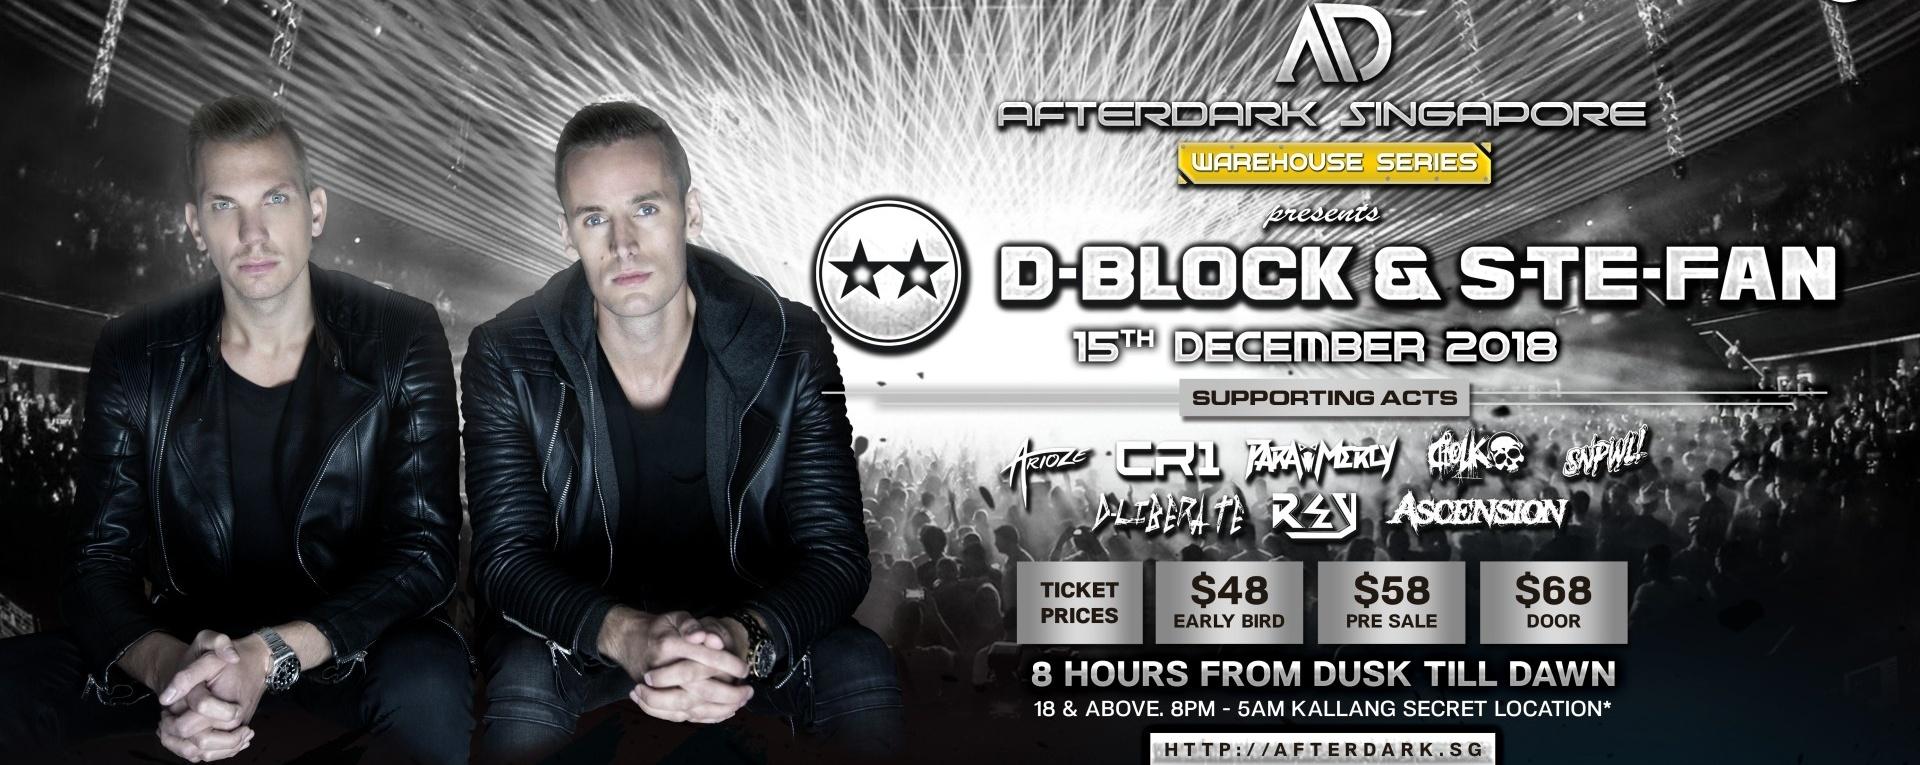 AfterDark Singapore Presents D-Block & S-te-Fan (Live in Singapore 2018)